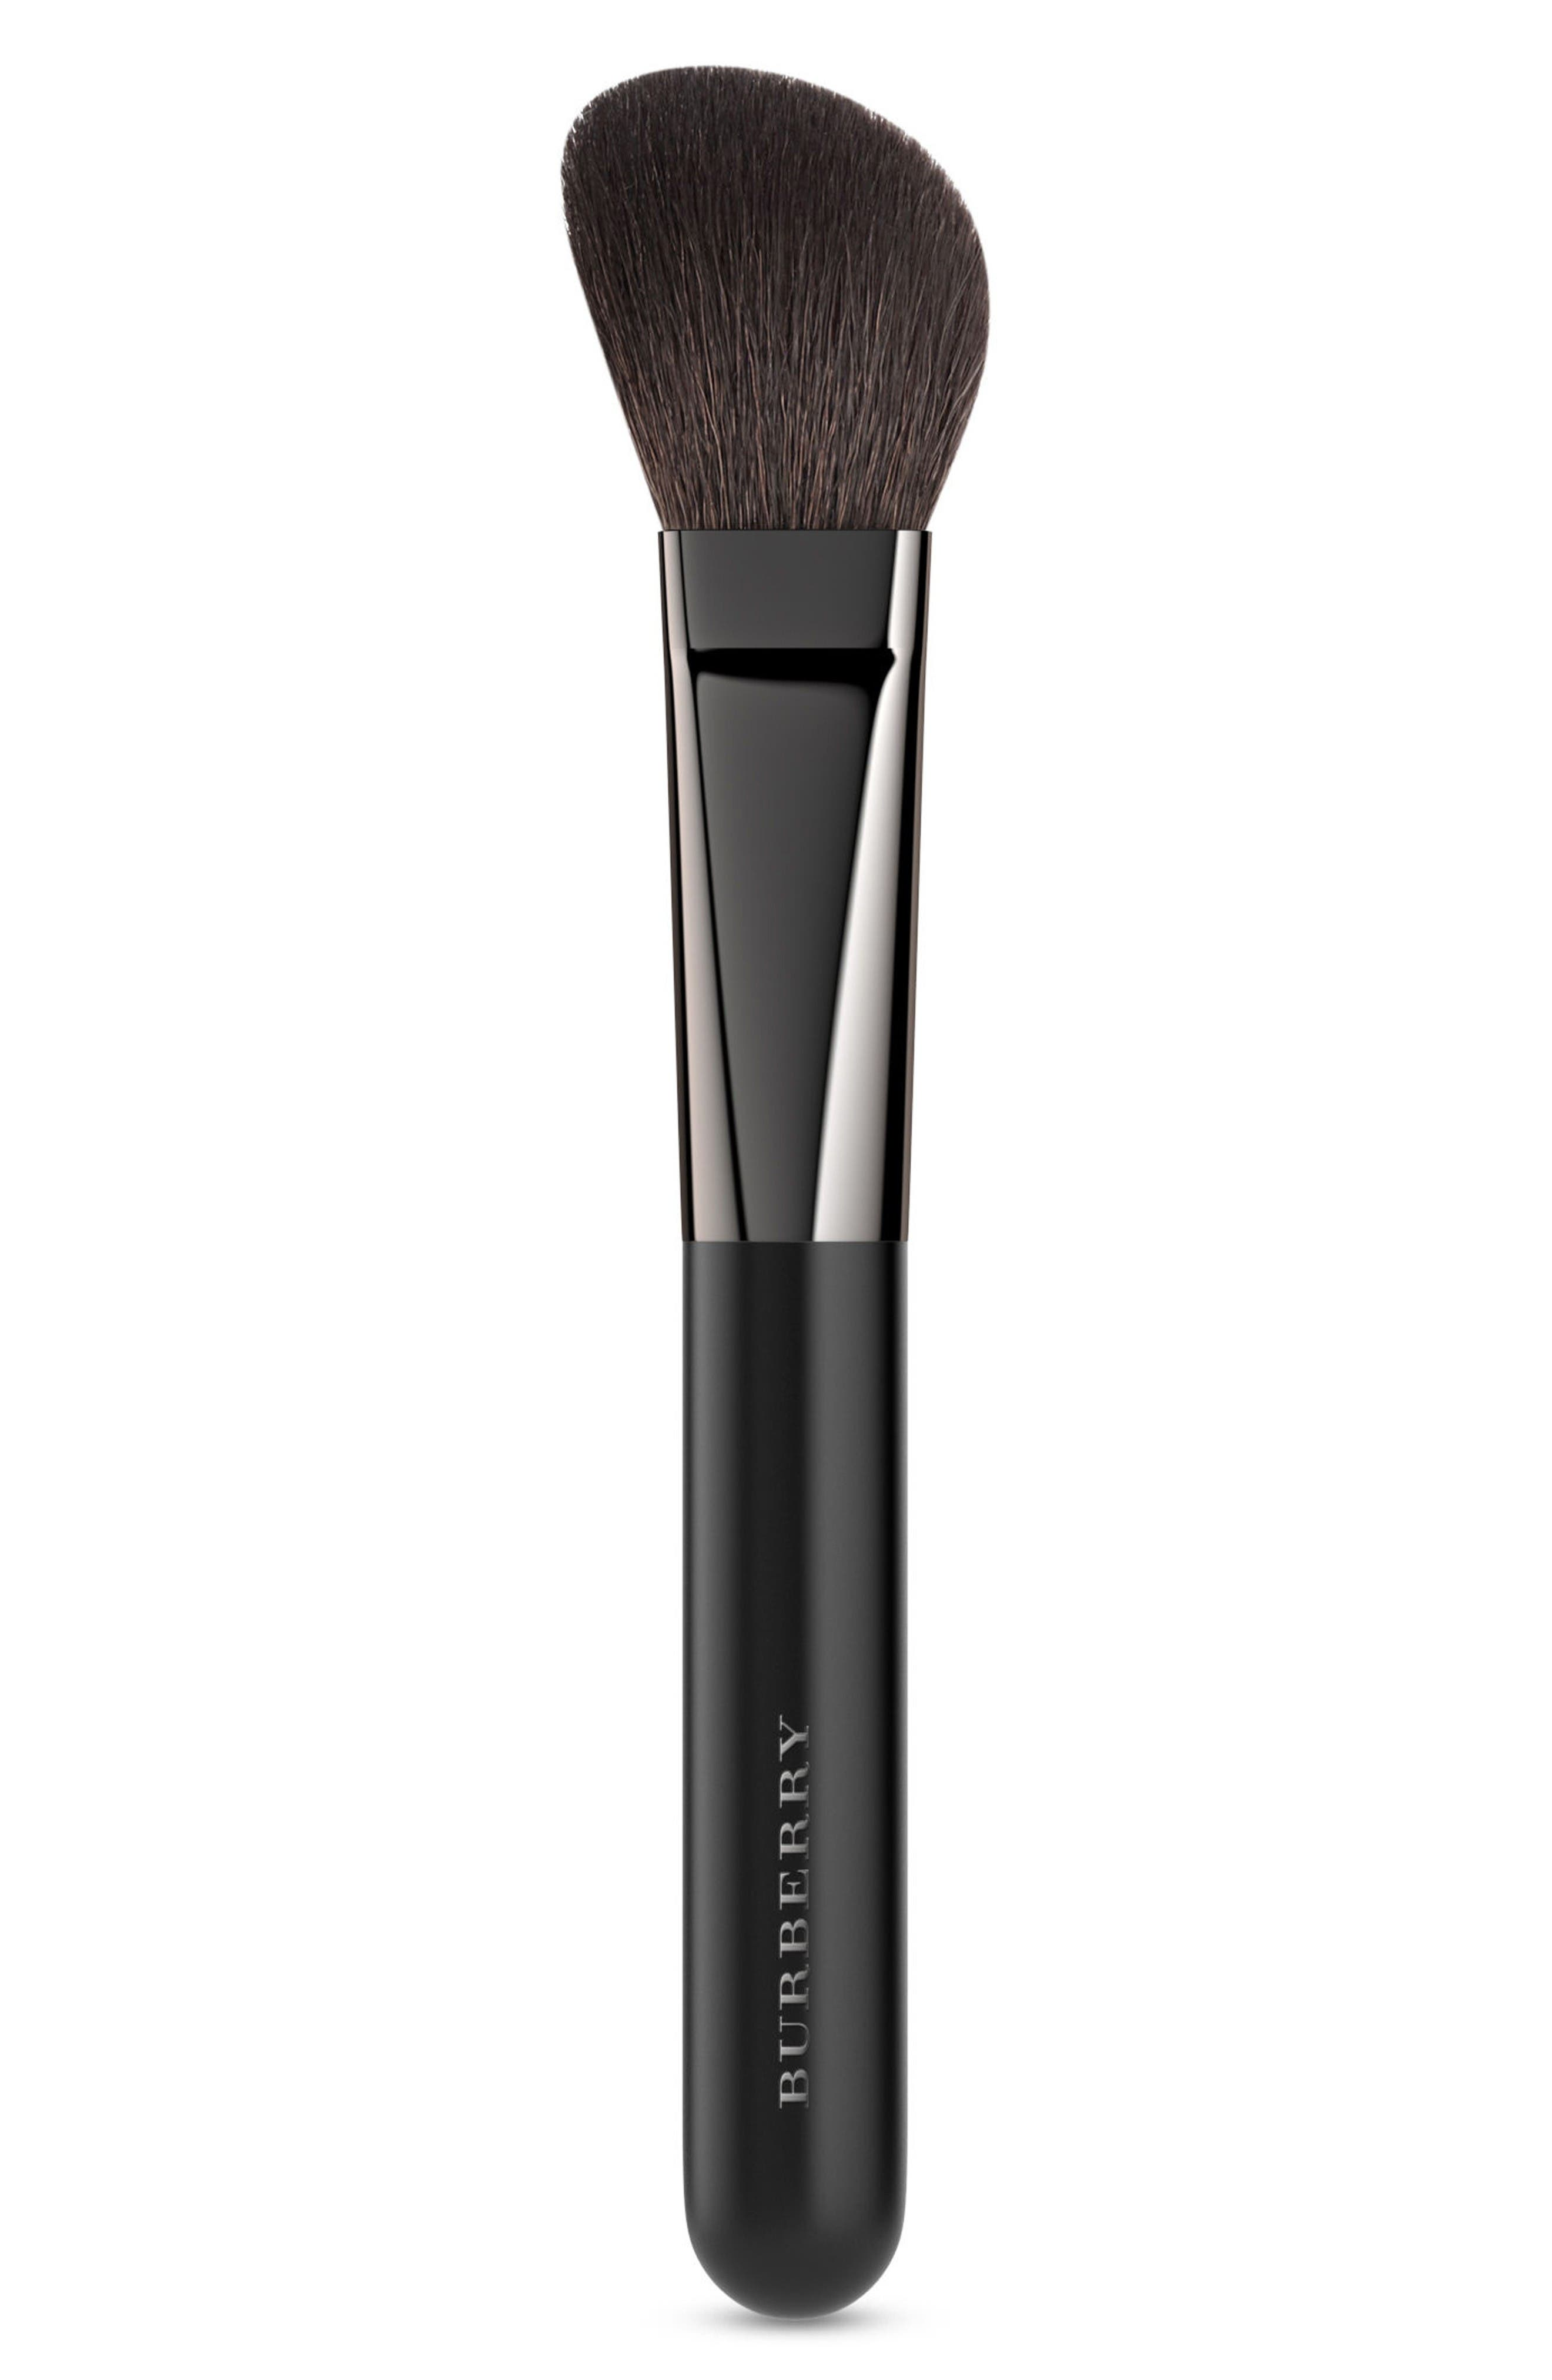 Burberry Beauty Blush Brush No. 2